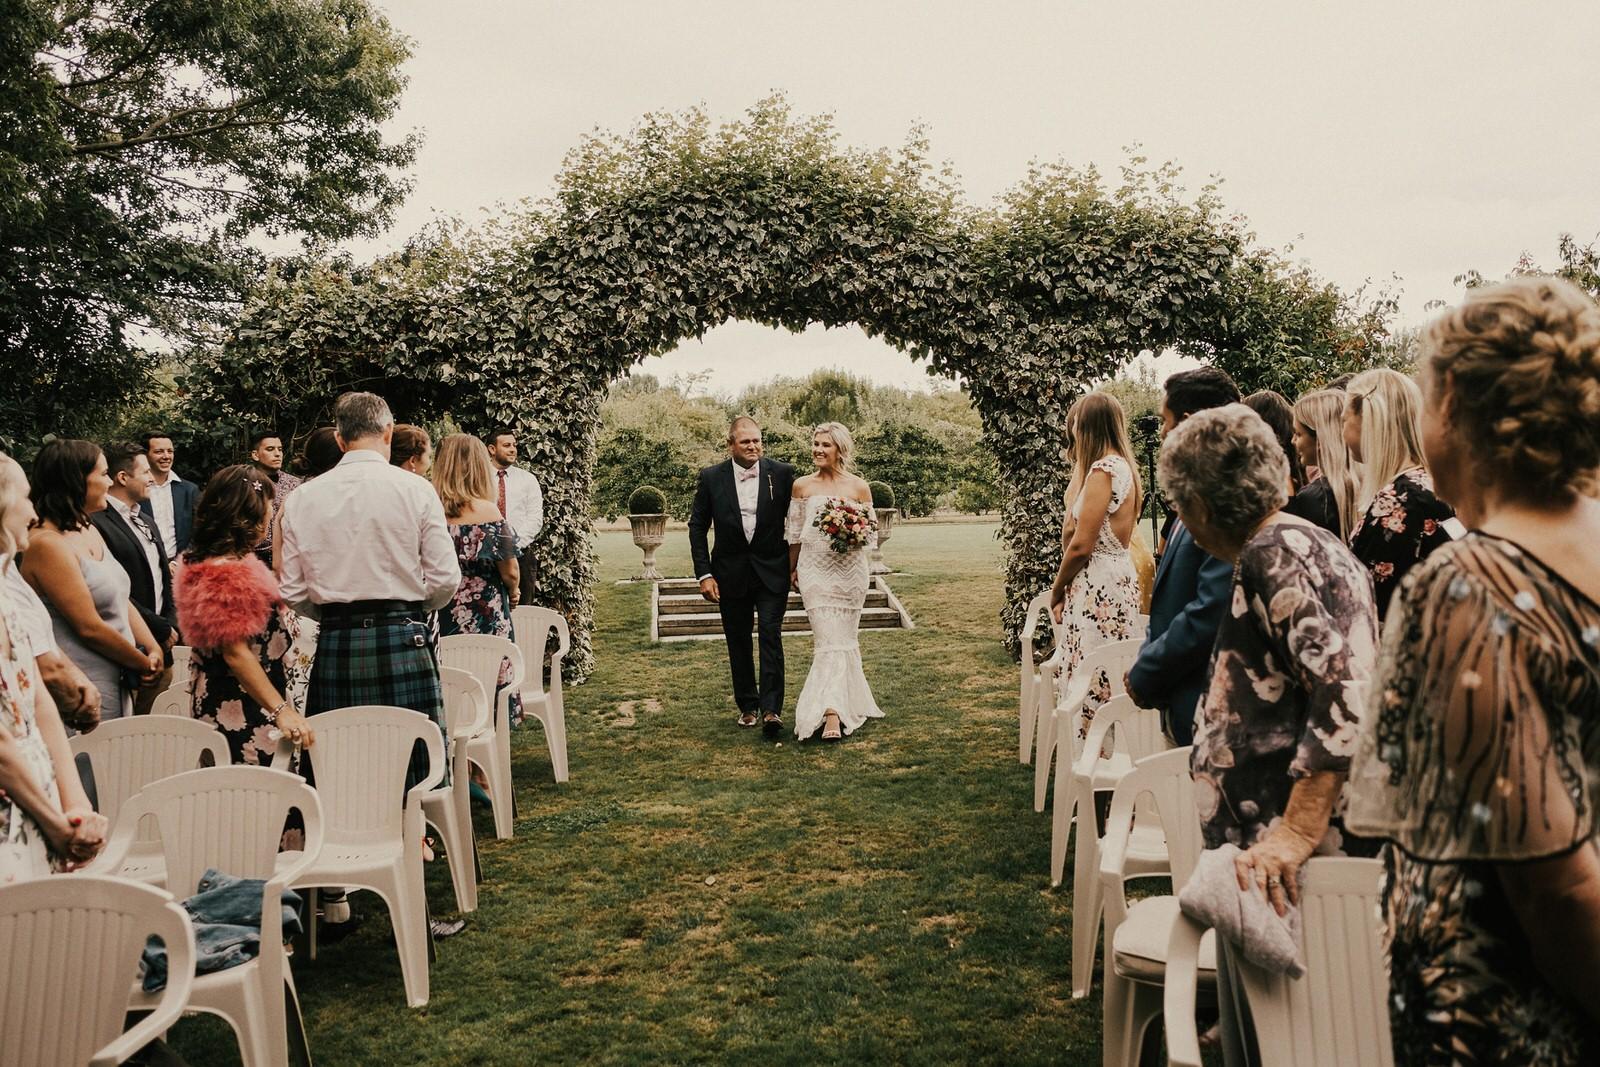 Wairarapa-Wedding_The-Landing_037.JPG